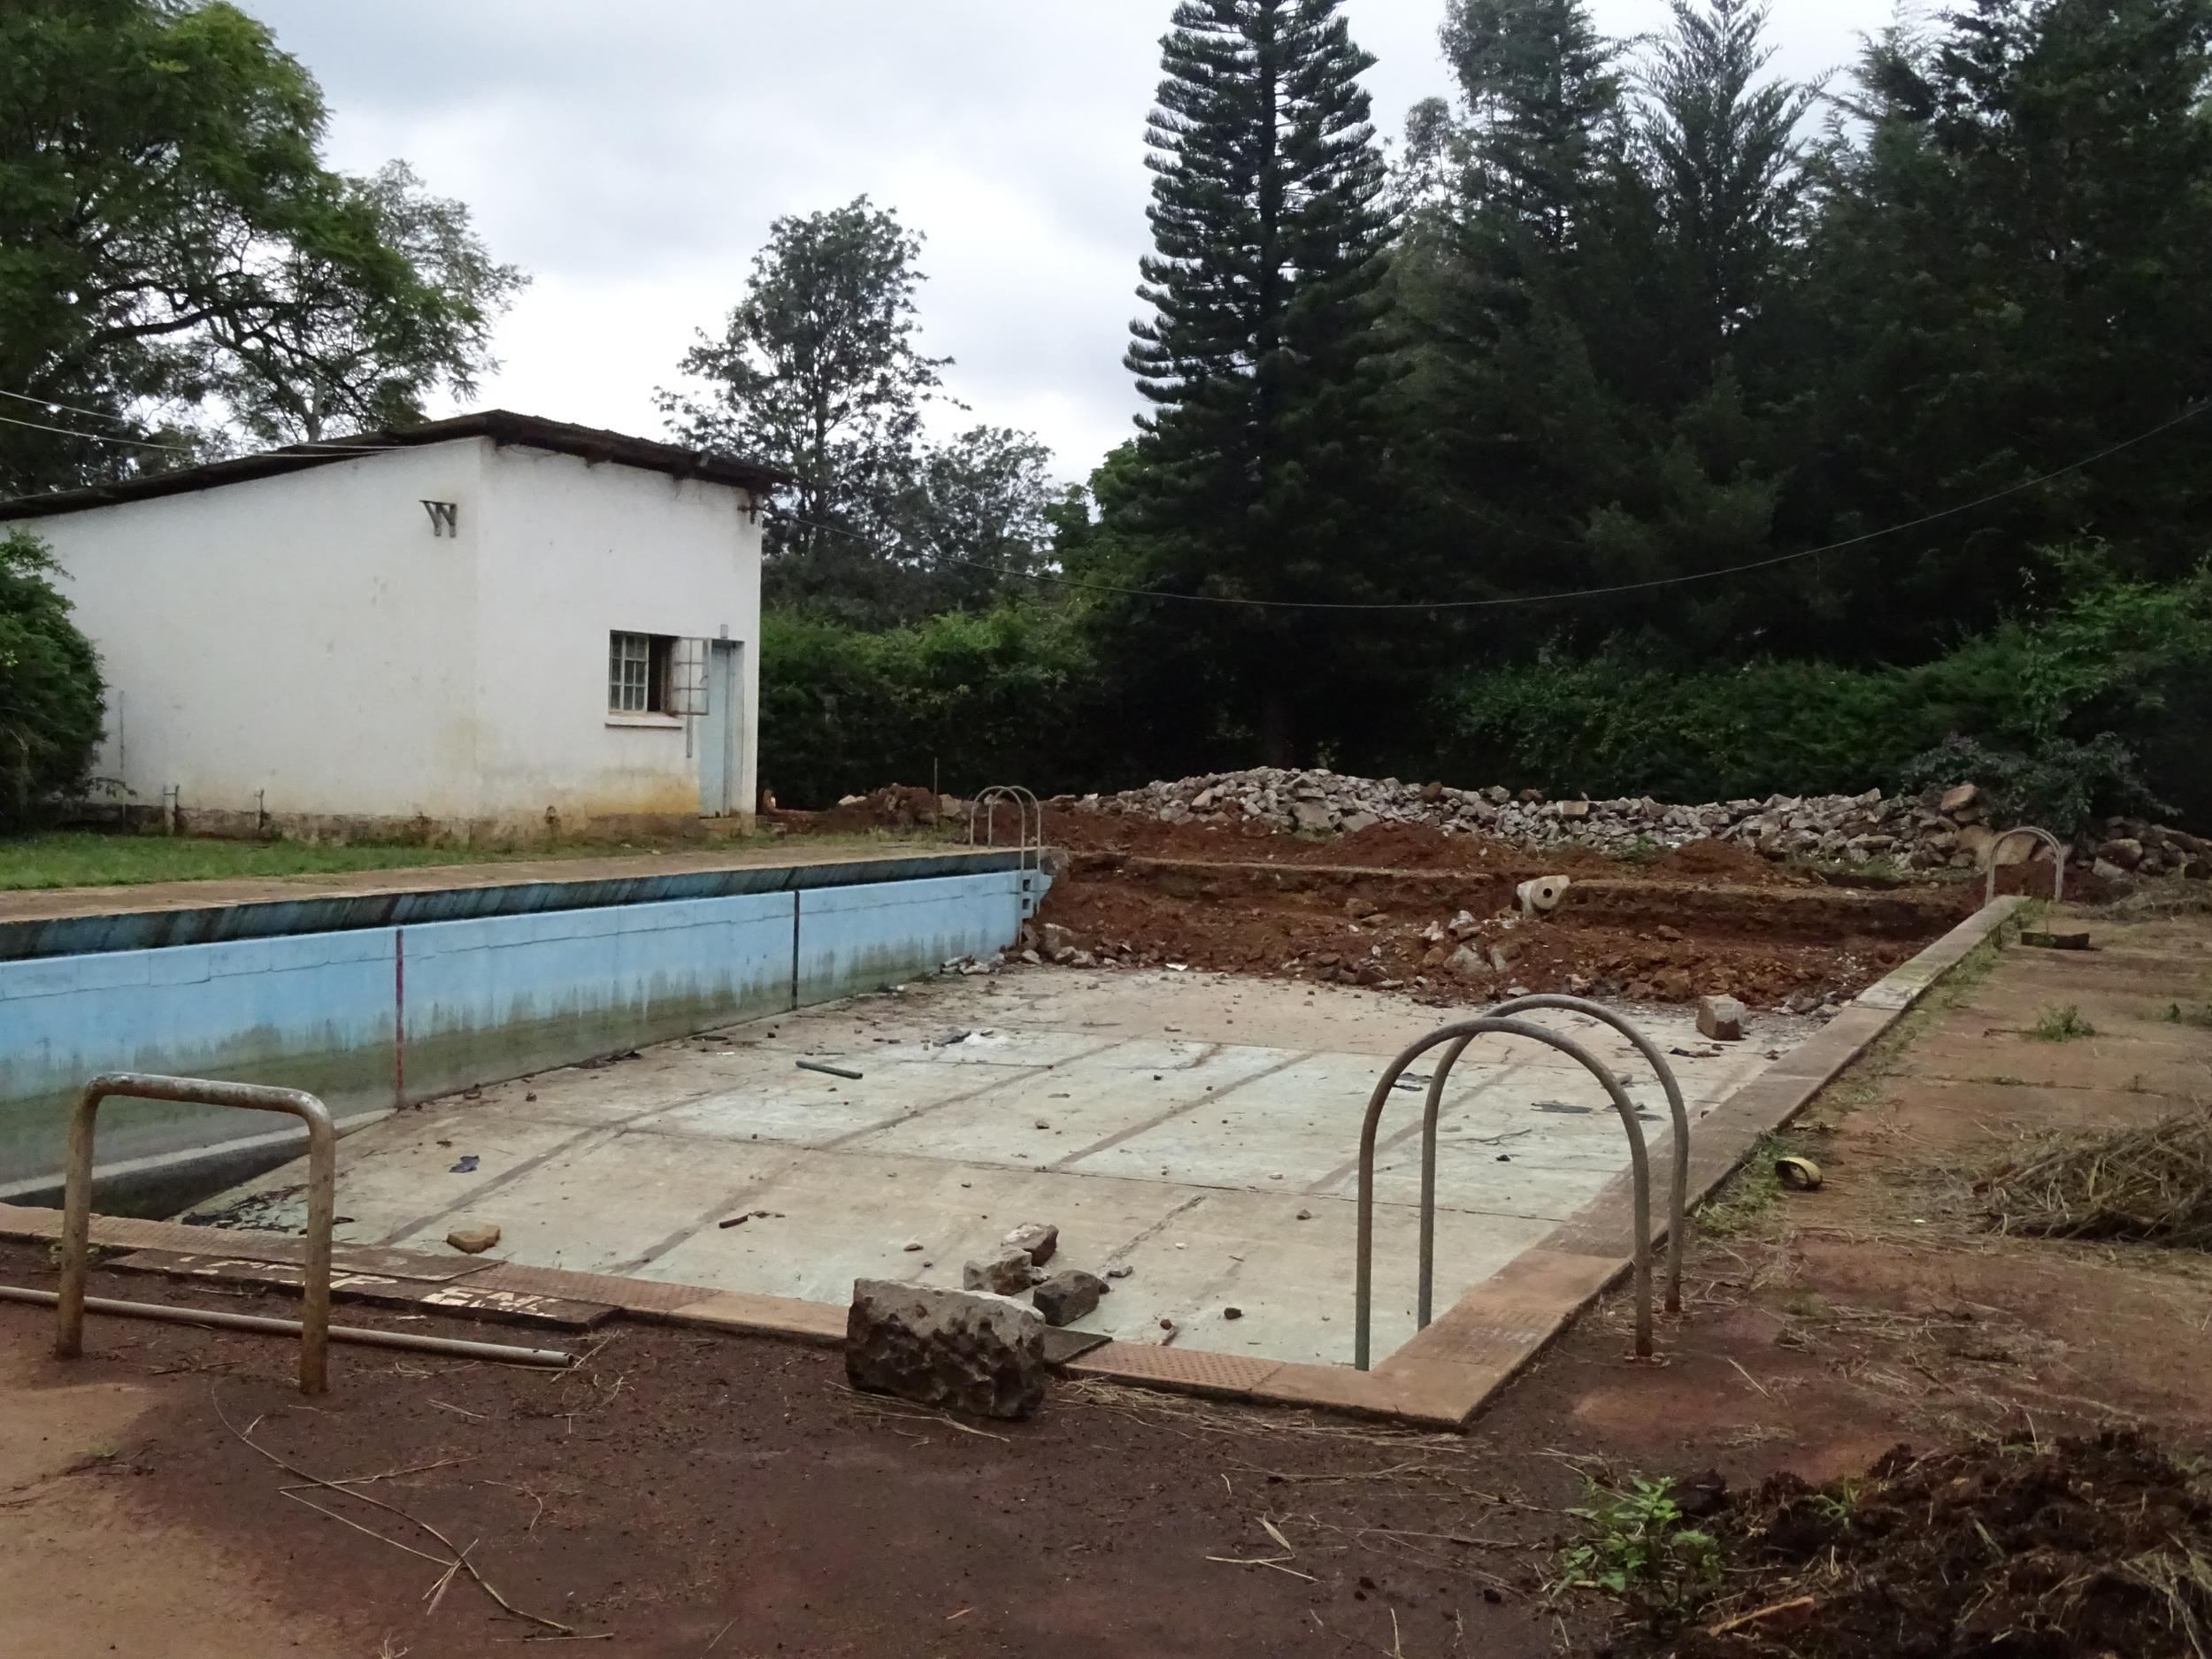 P14 View of pool - 23-06-16.JPG